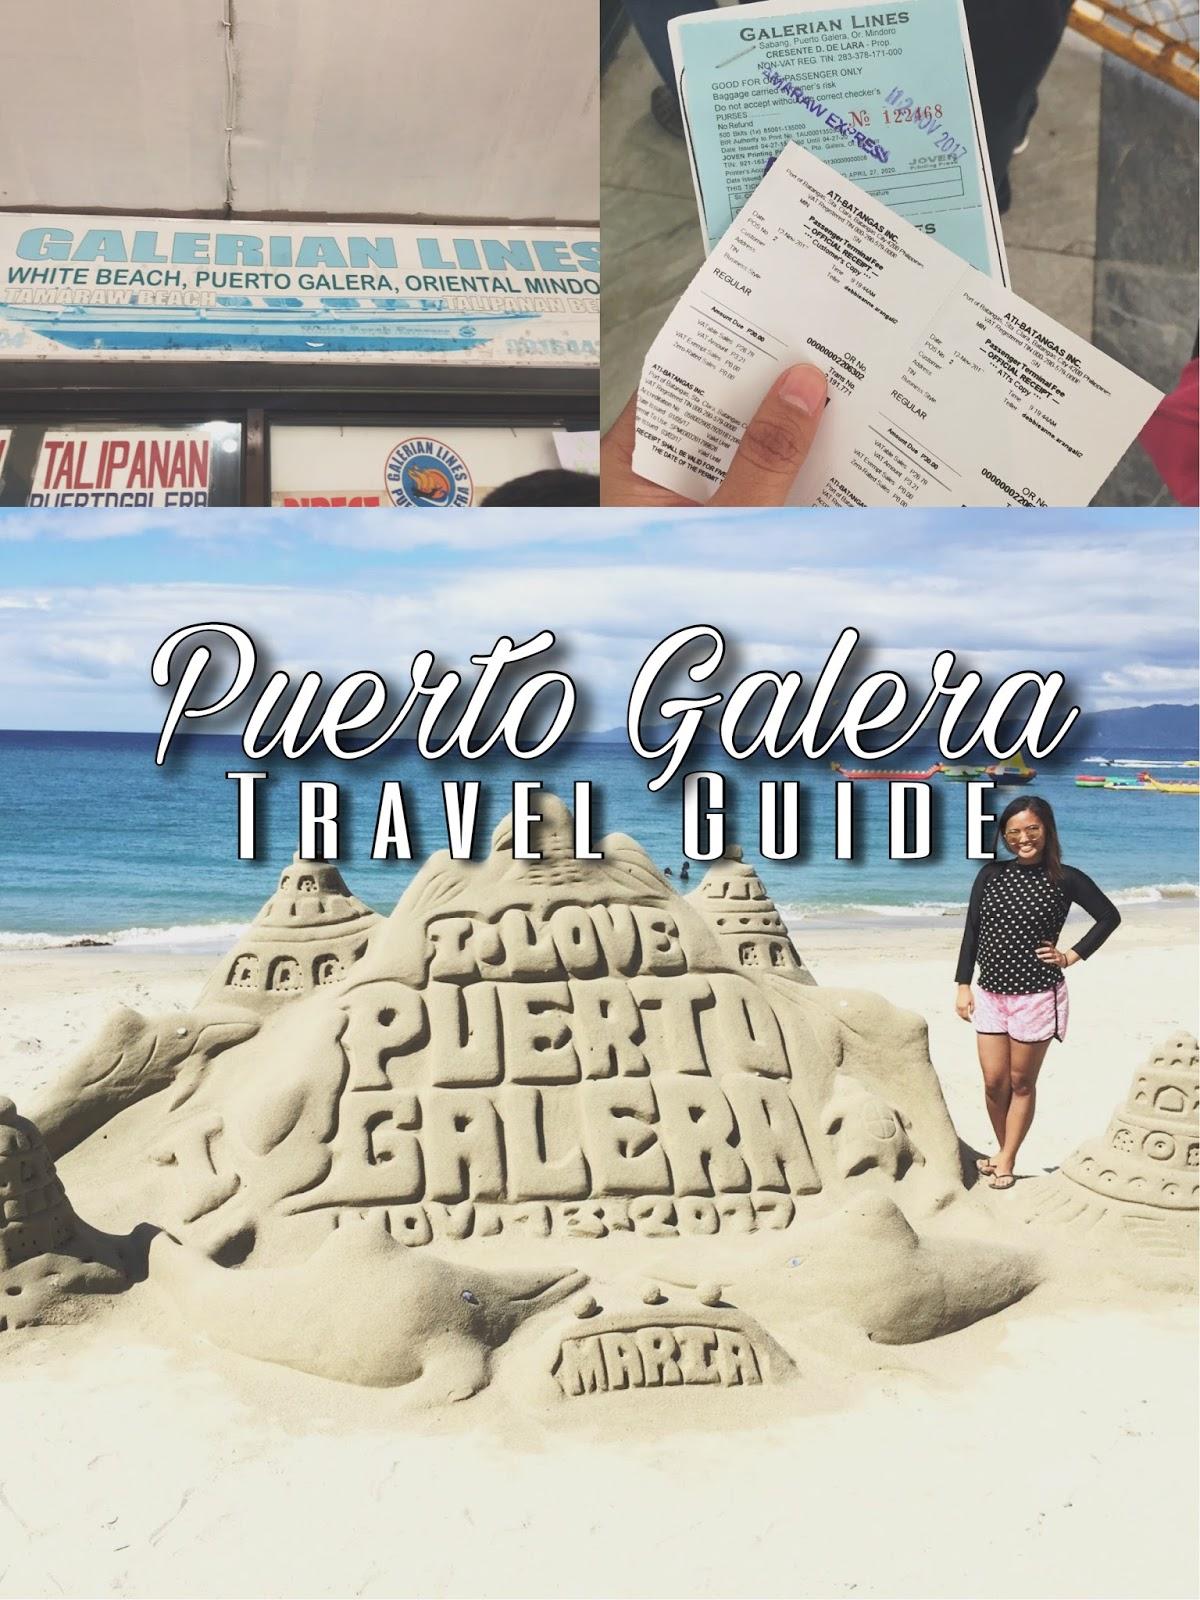 Puerto Galera Travel Guide